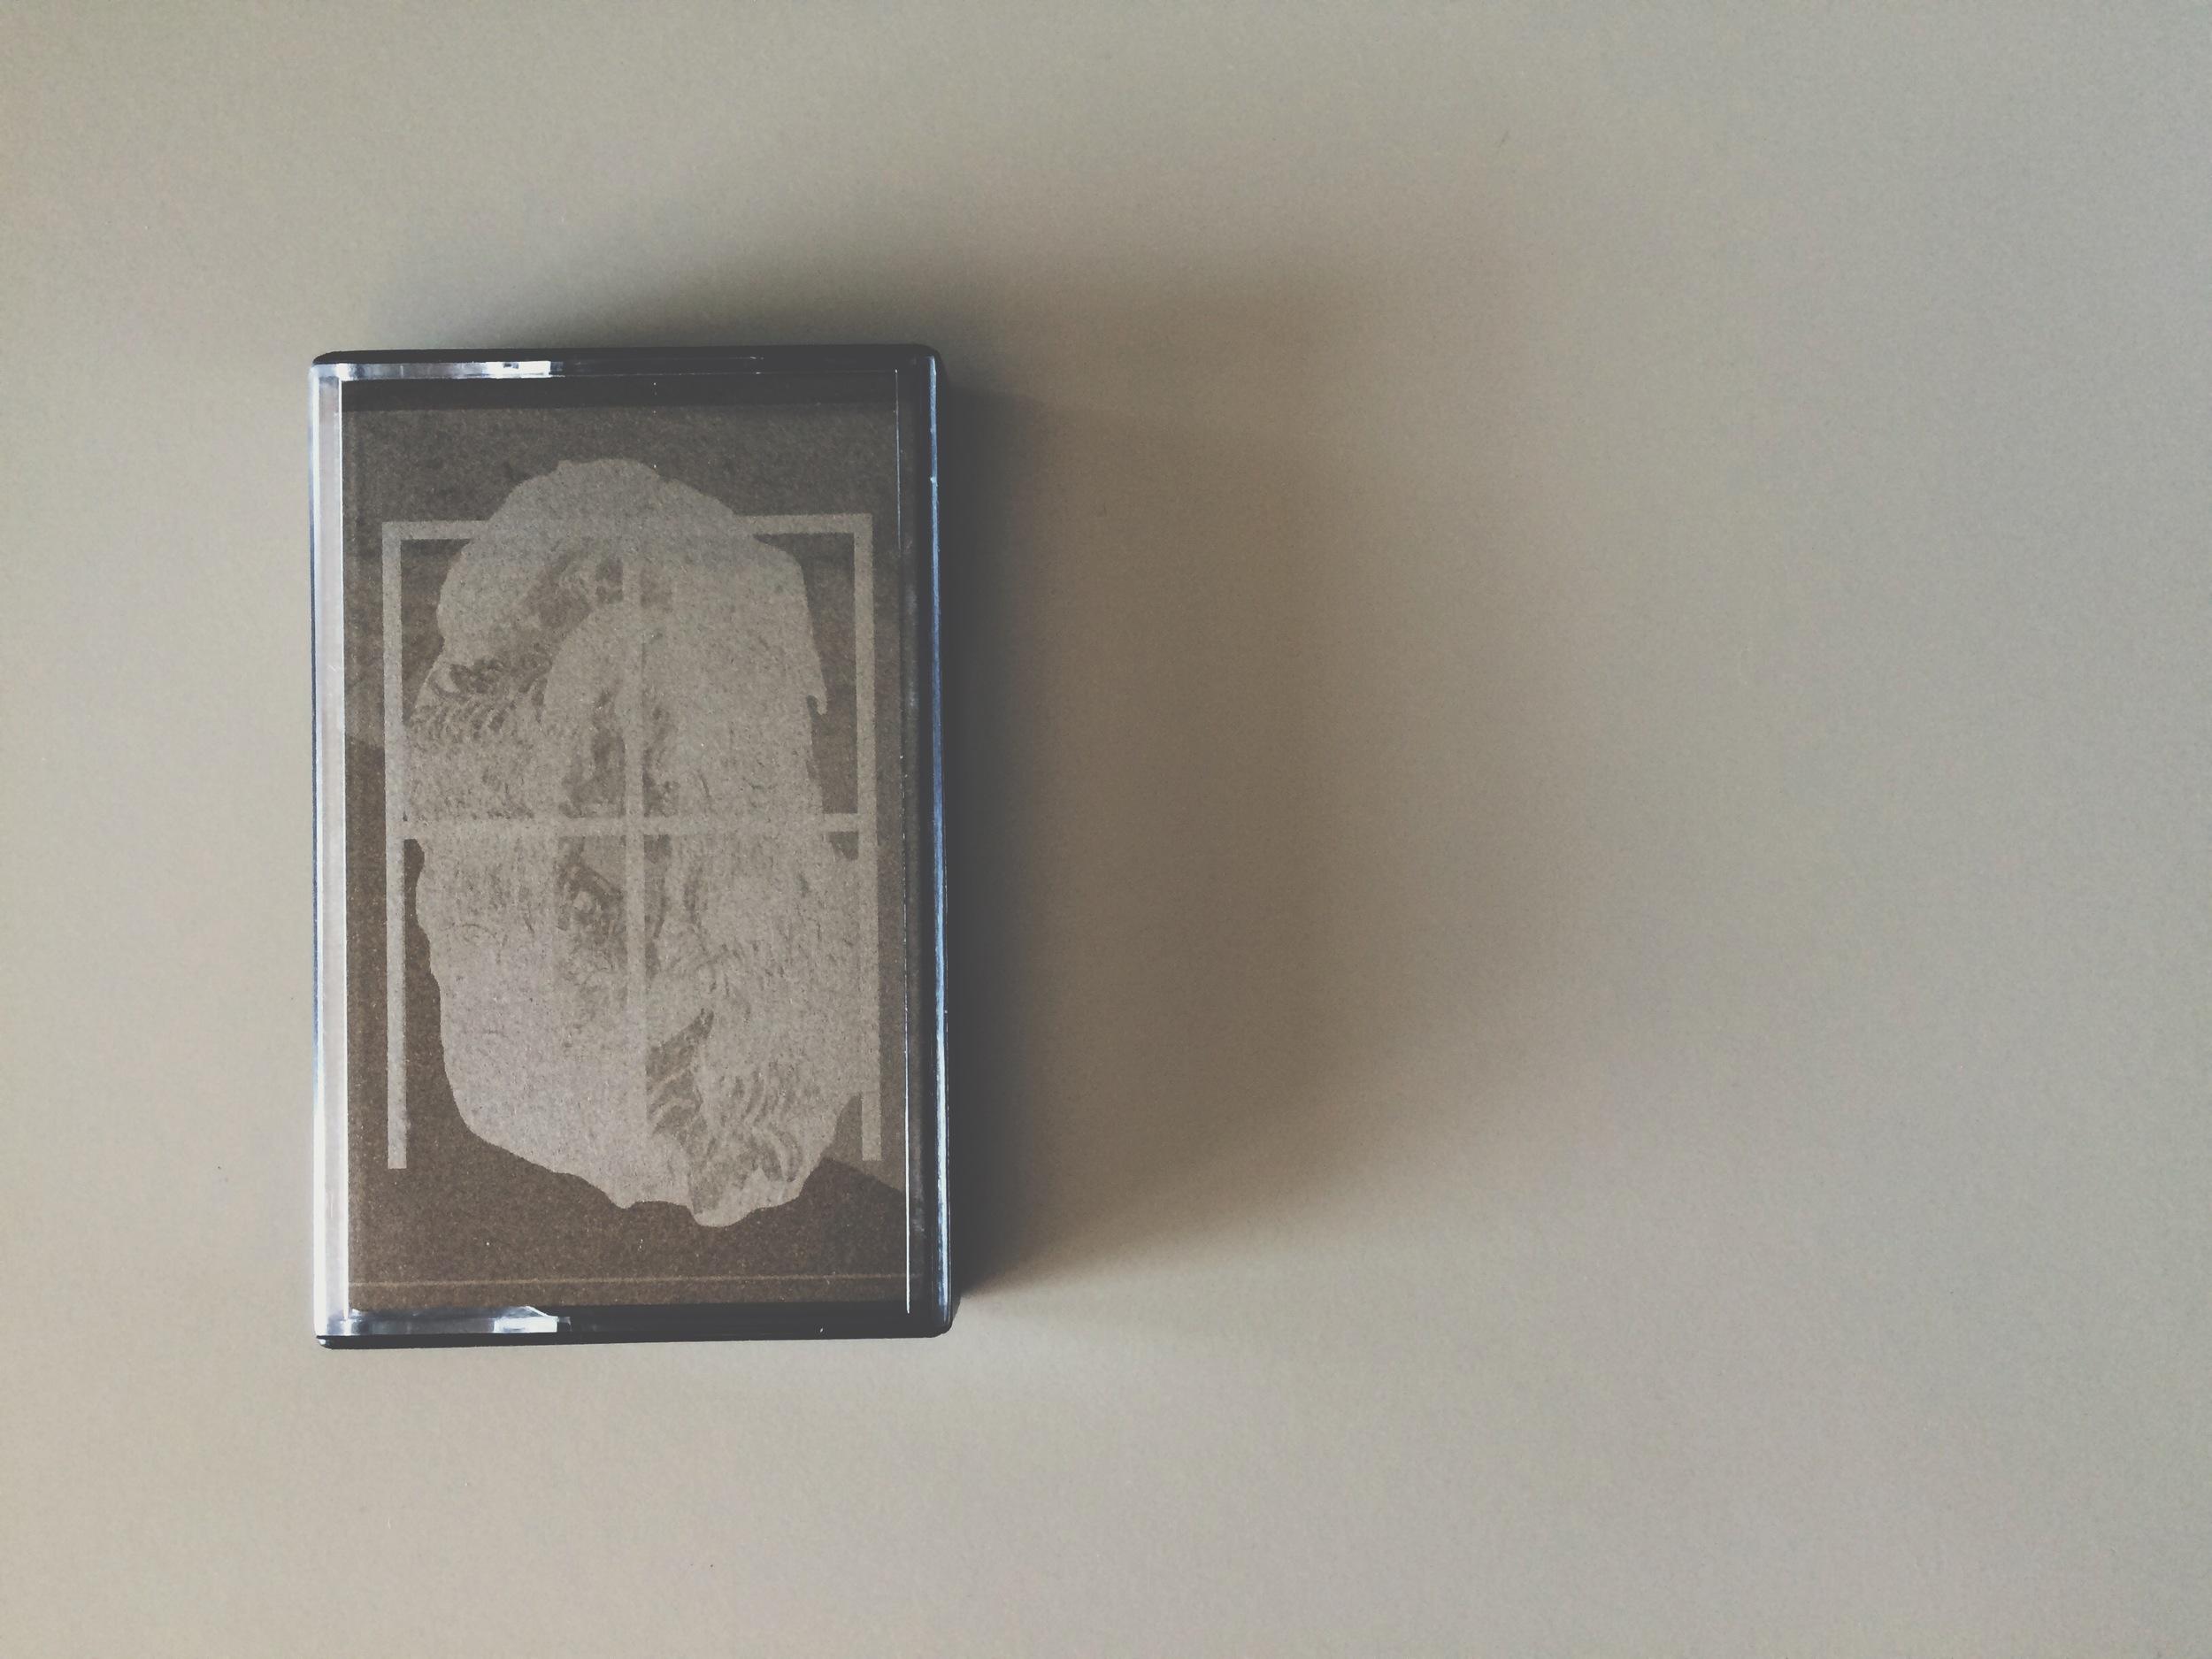 09 Terrence Hannum - FInal Salt.jpg